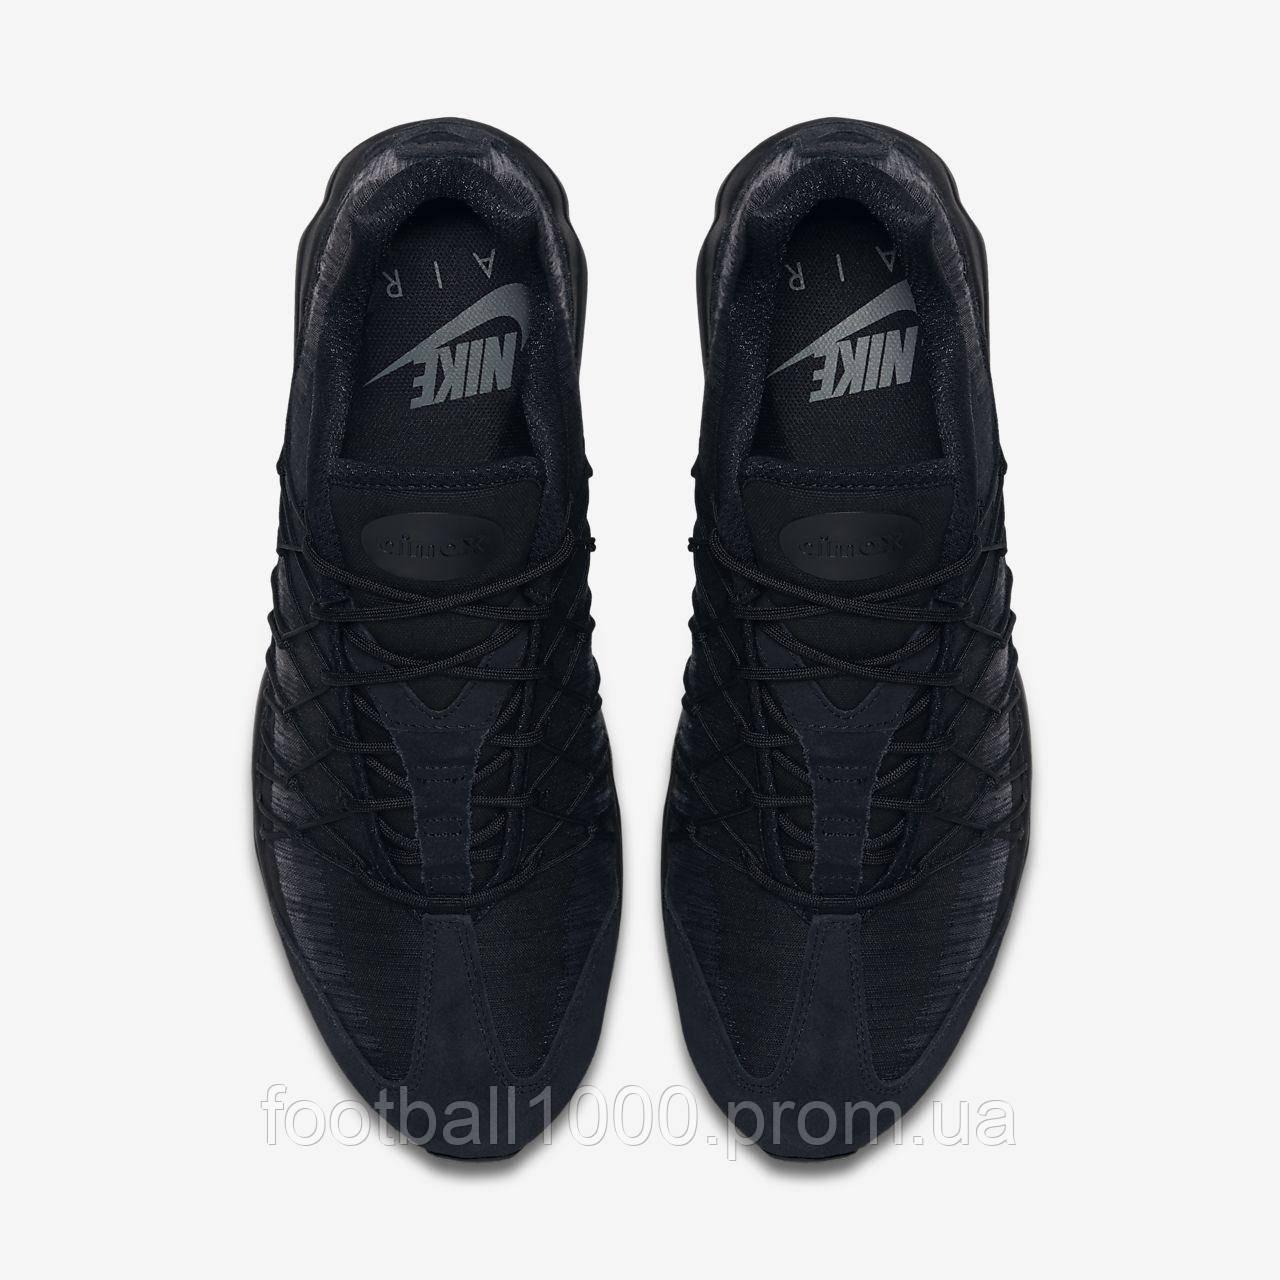 buy popular 5b626 b61c8 Кроссовки мужские Nike Air Max 95 Ultra Jacquard 749771-005, ...